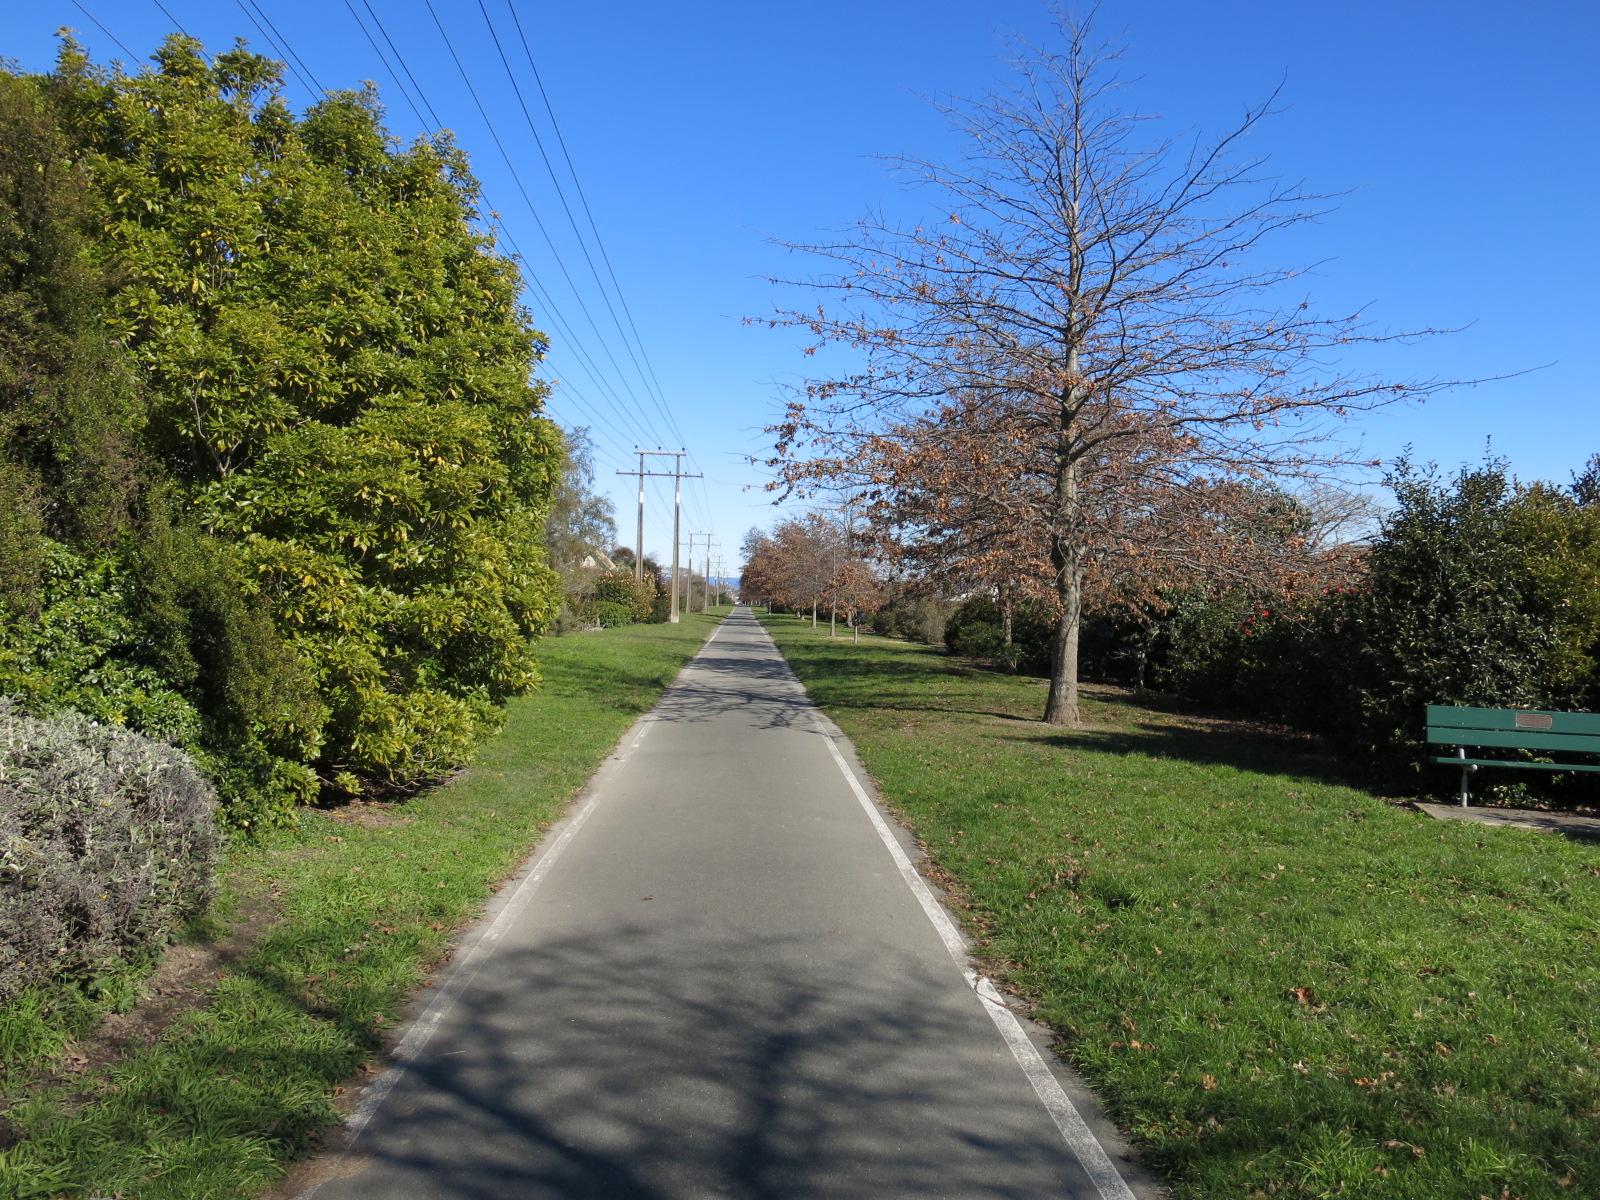 Rail Way Reserve 我が家の裏道を抜けるとこの遊歩道